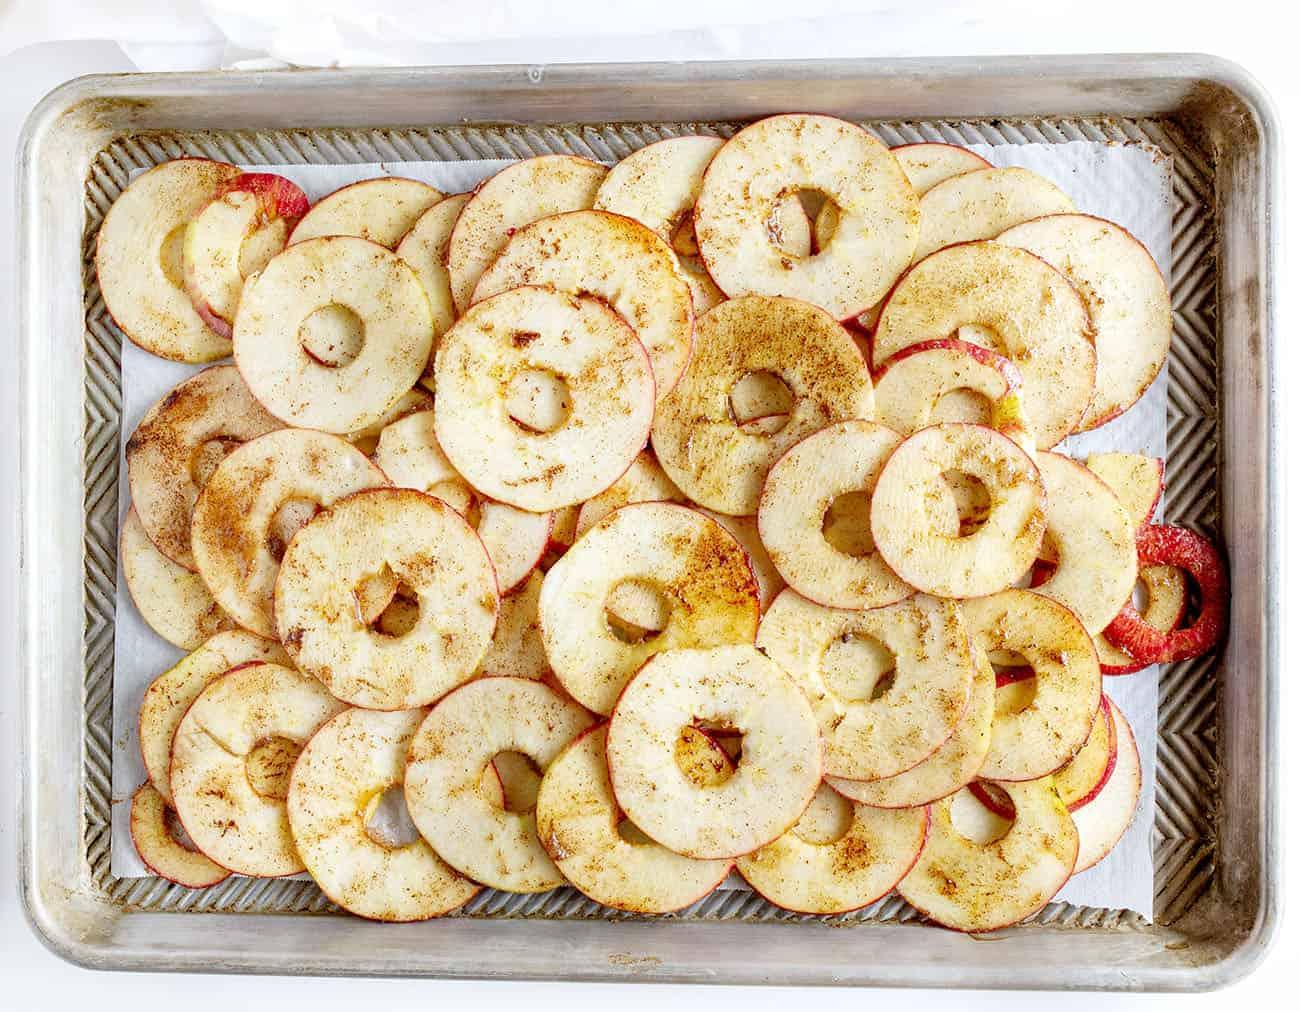 Spiced Apples Unbaked for Homemade Apple Galette